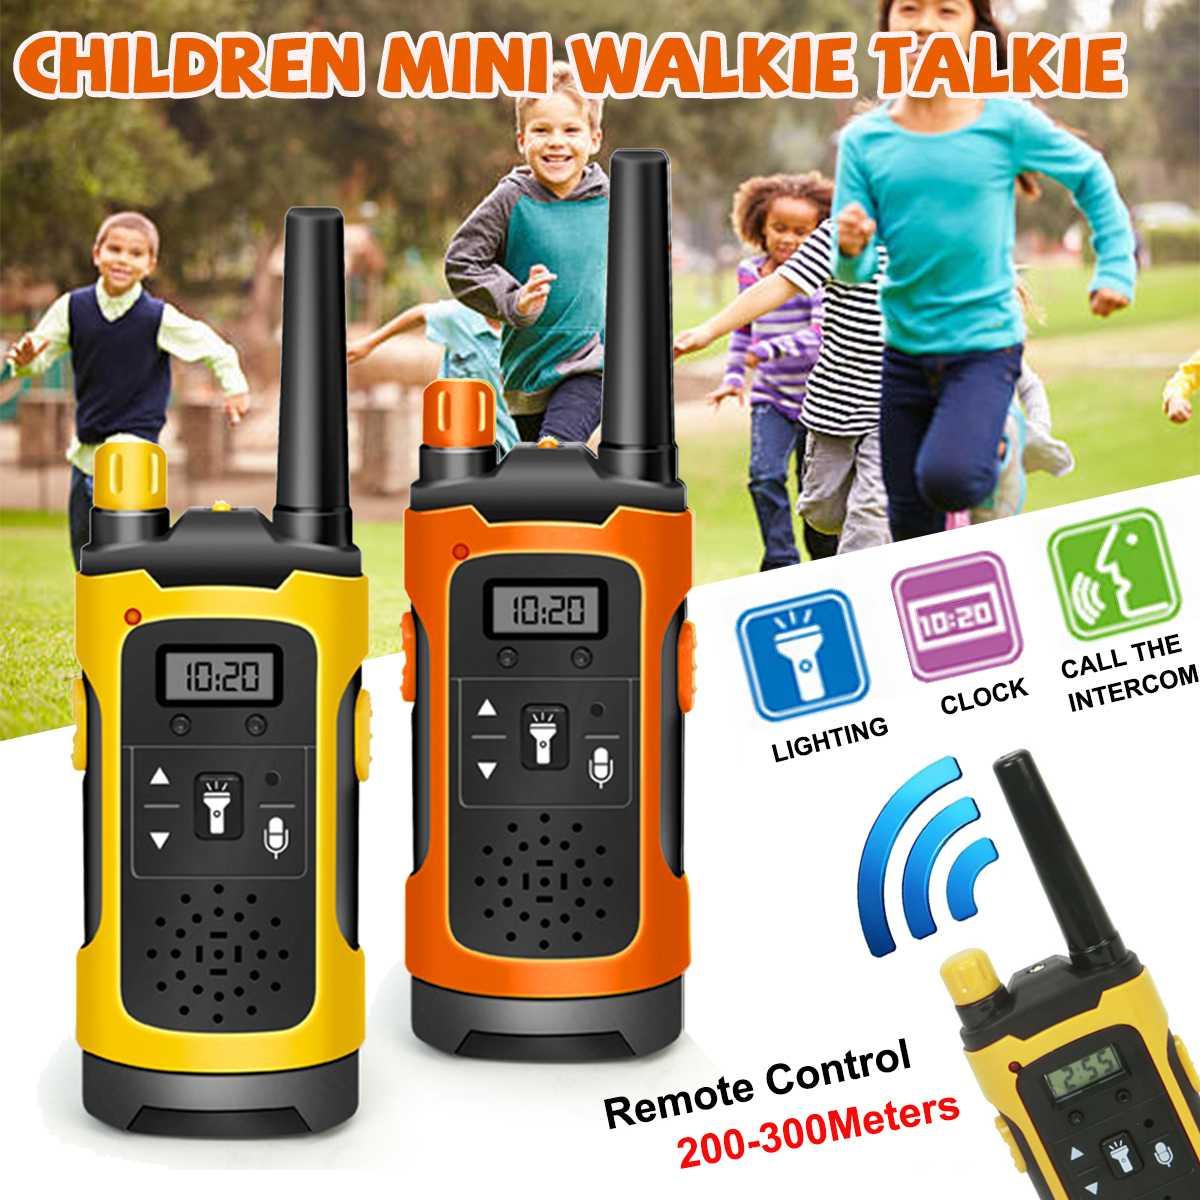 2pcs Mini 200-300M Kids Walkie Talkies Toy Child Electronic Radio Voice Interphone Toy Outdoor Wireless Walkie Talkies Toy